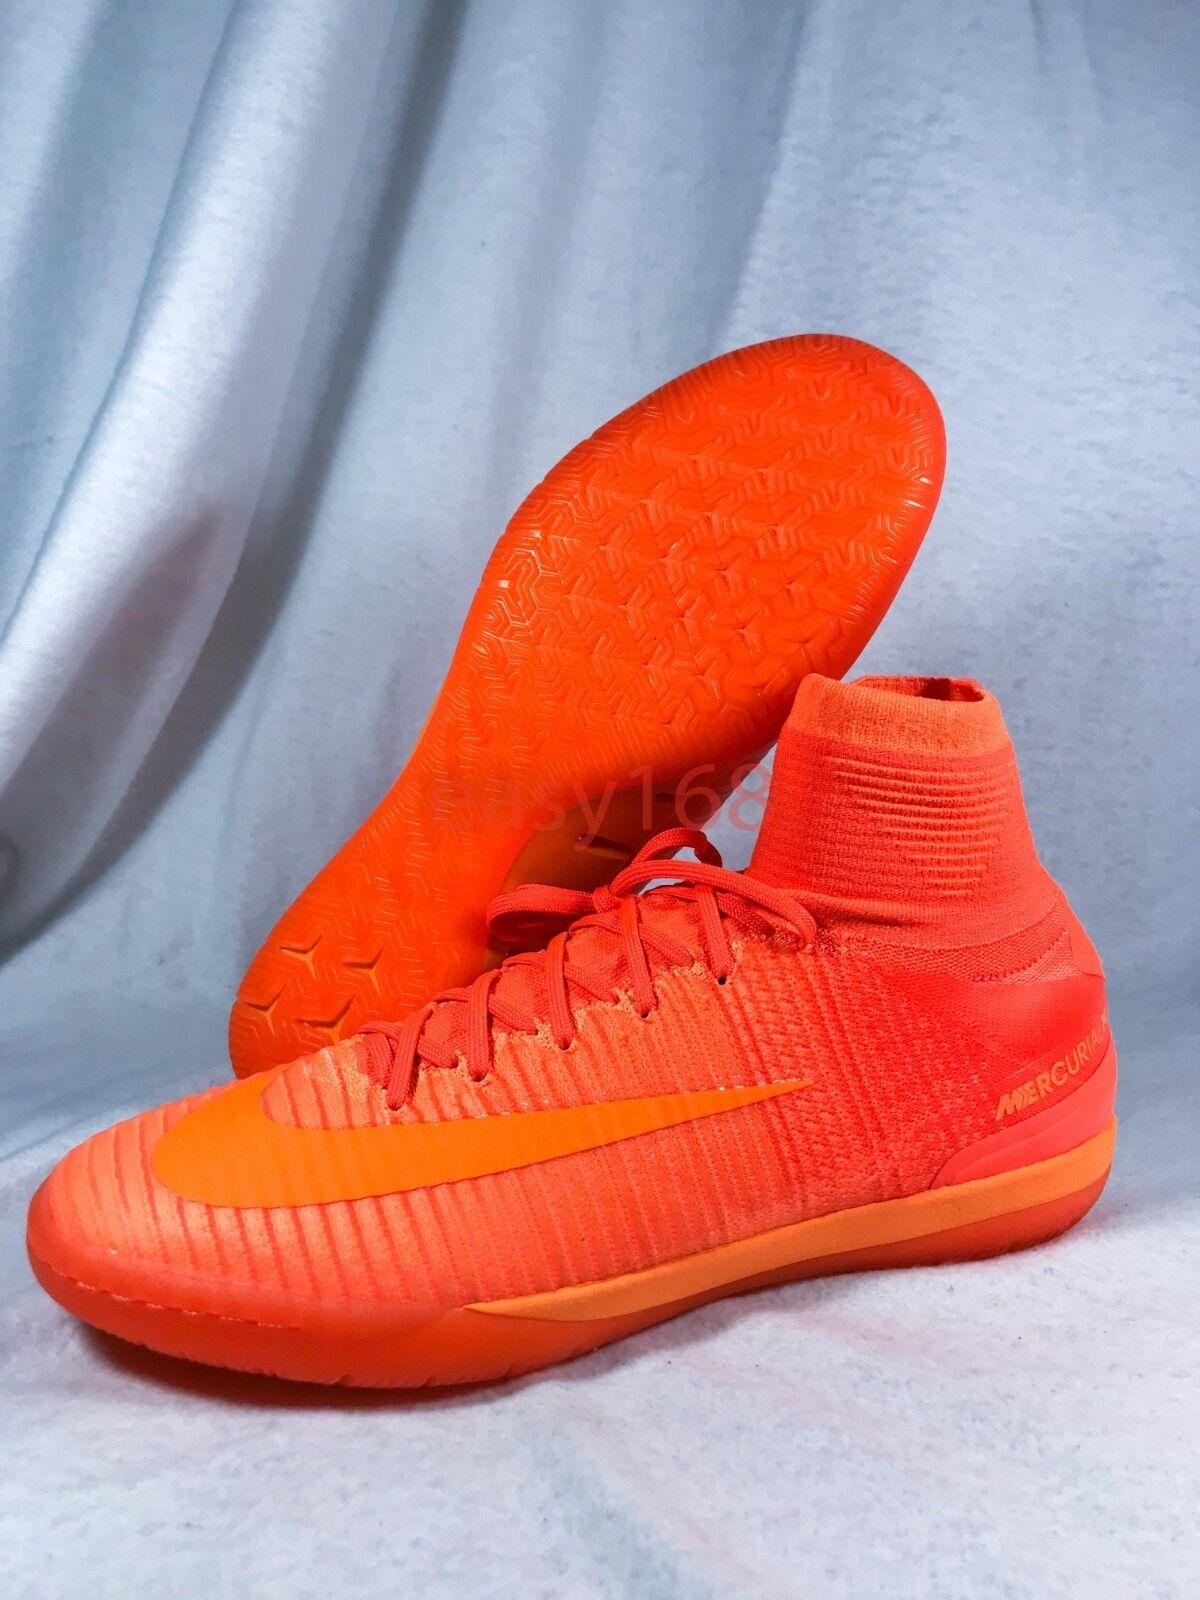 New Nike MercurialX Proximo IC Sz 10 orange 831976-888 Indoor Soccer shoes 44